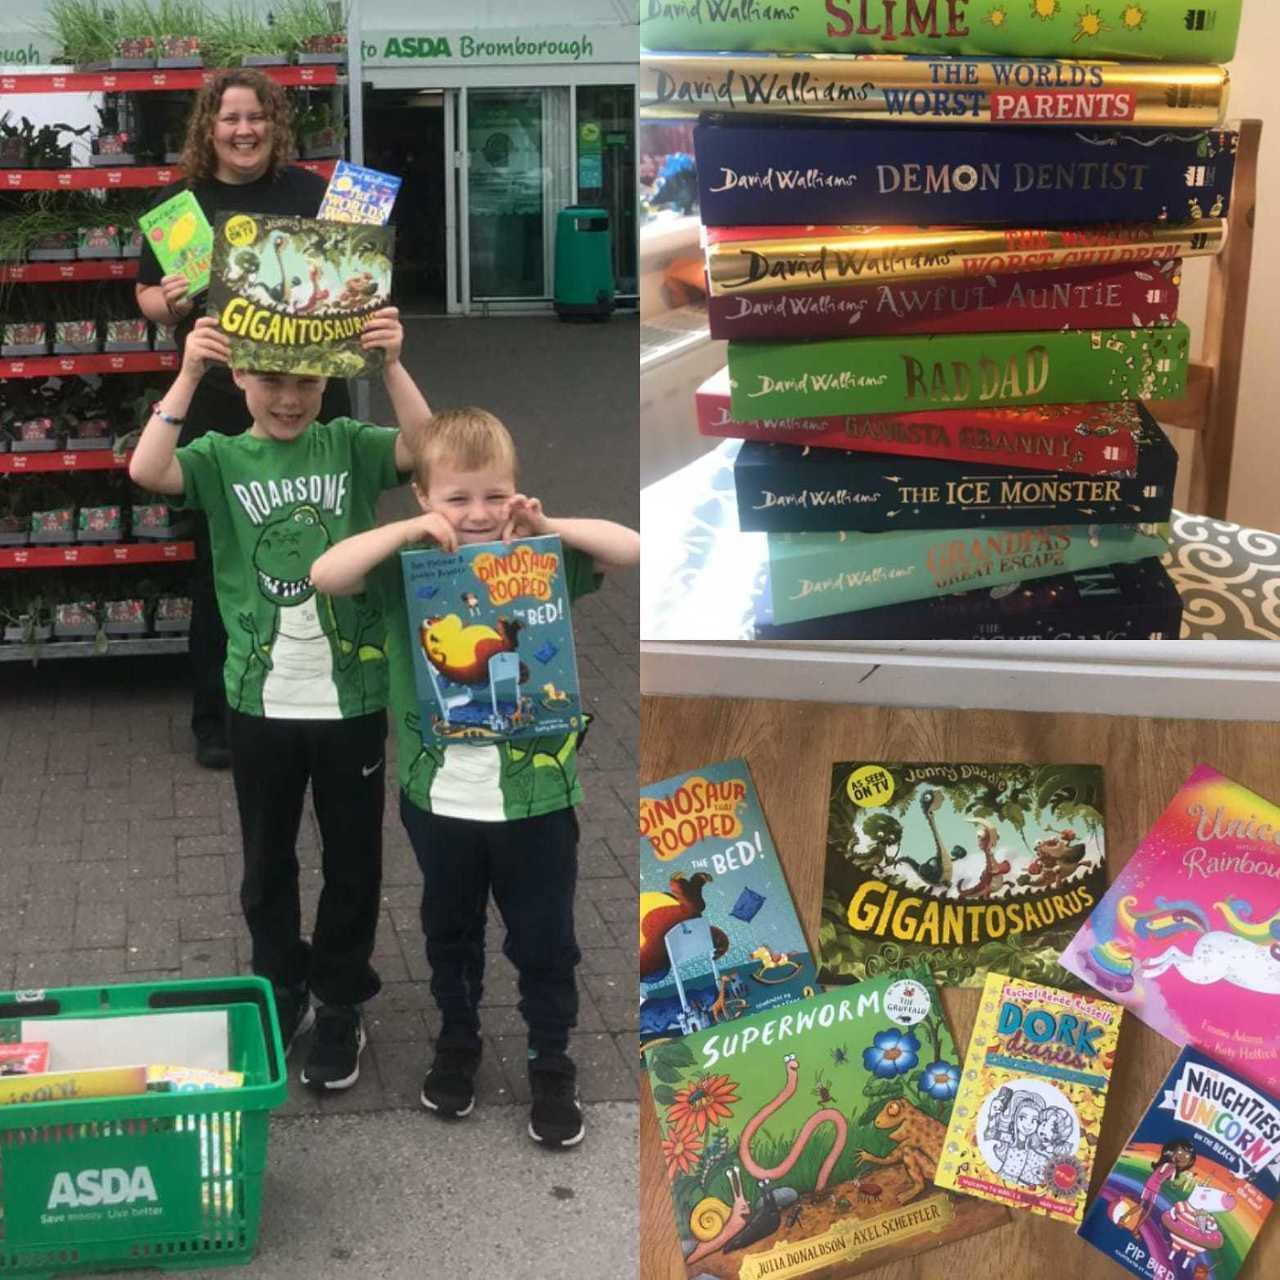 Helping Stanton Road PTA get back on track | Asda Bromborough